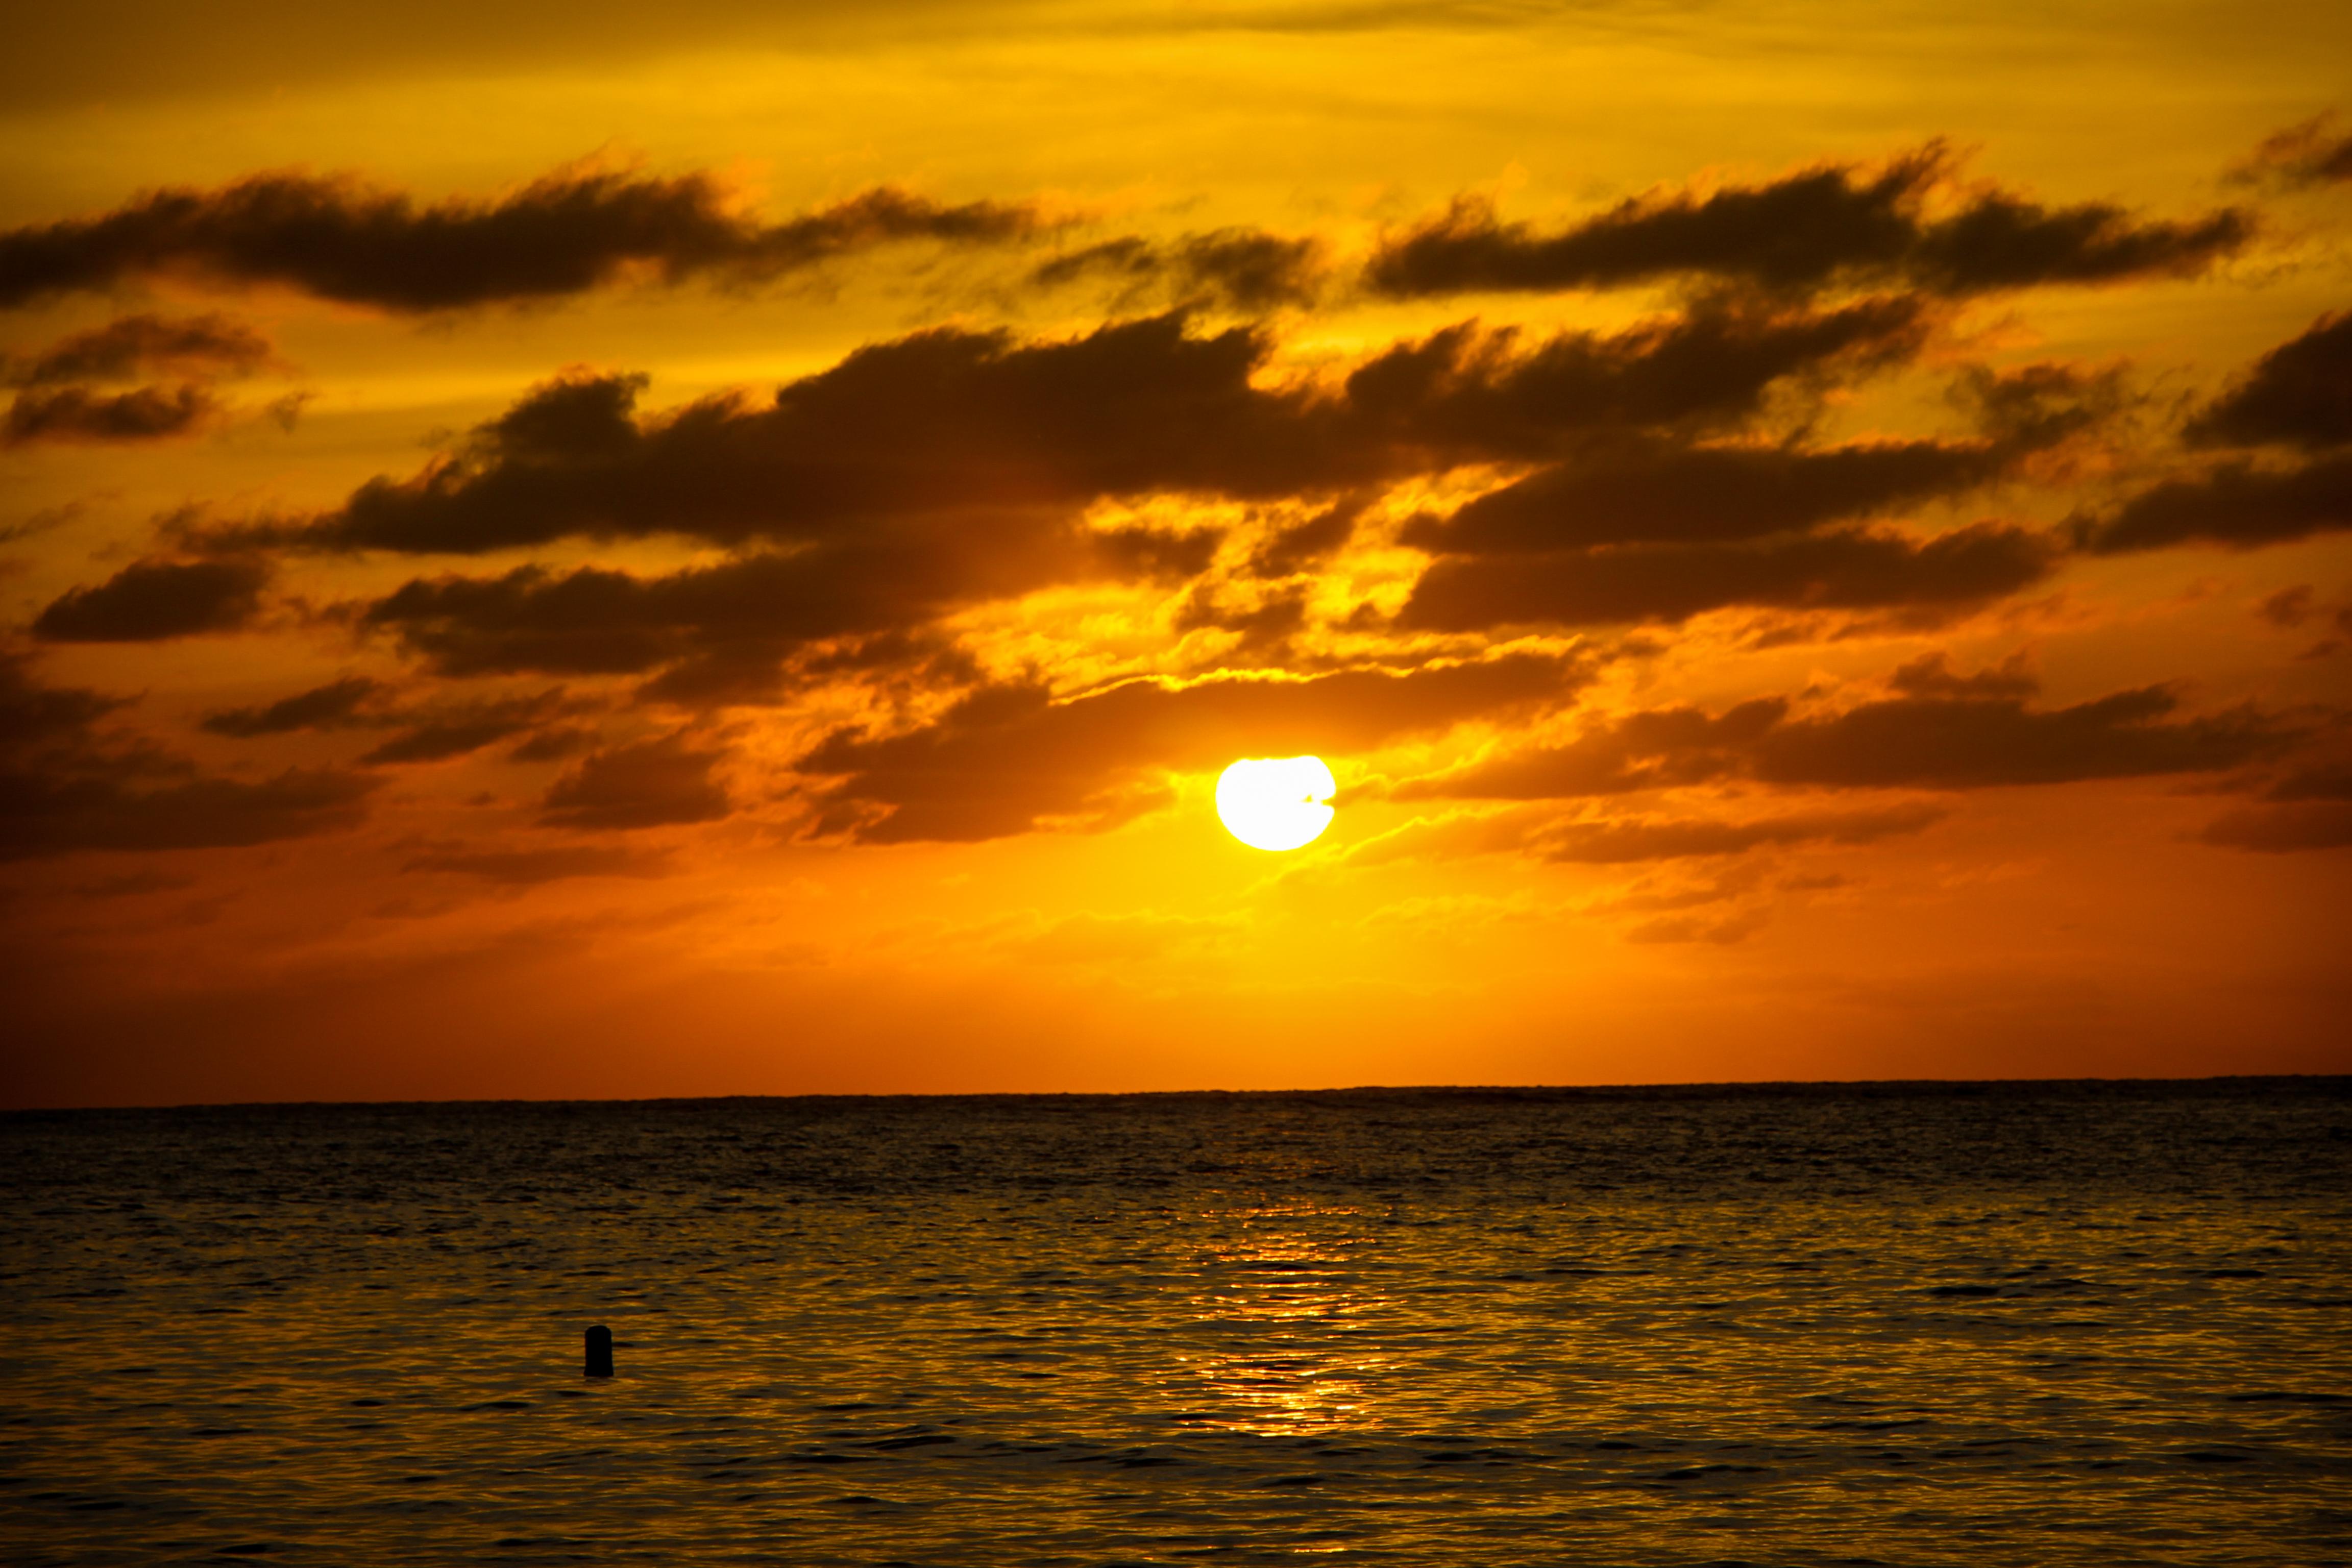 Pokai Bay Beach